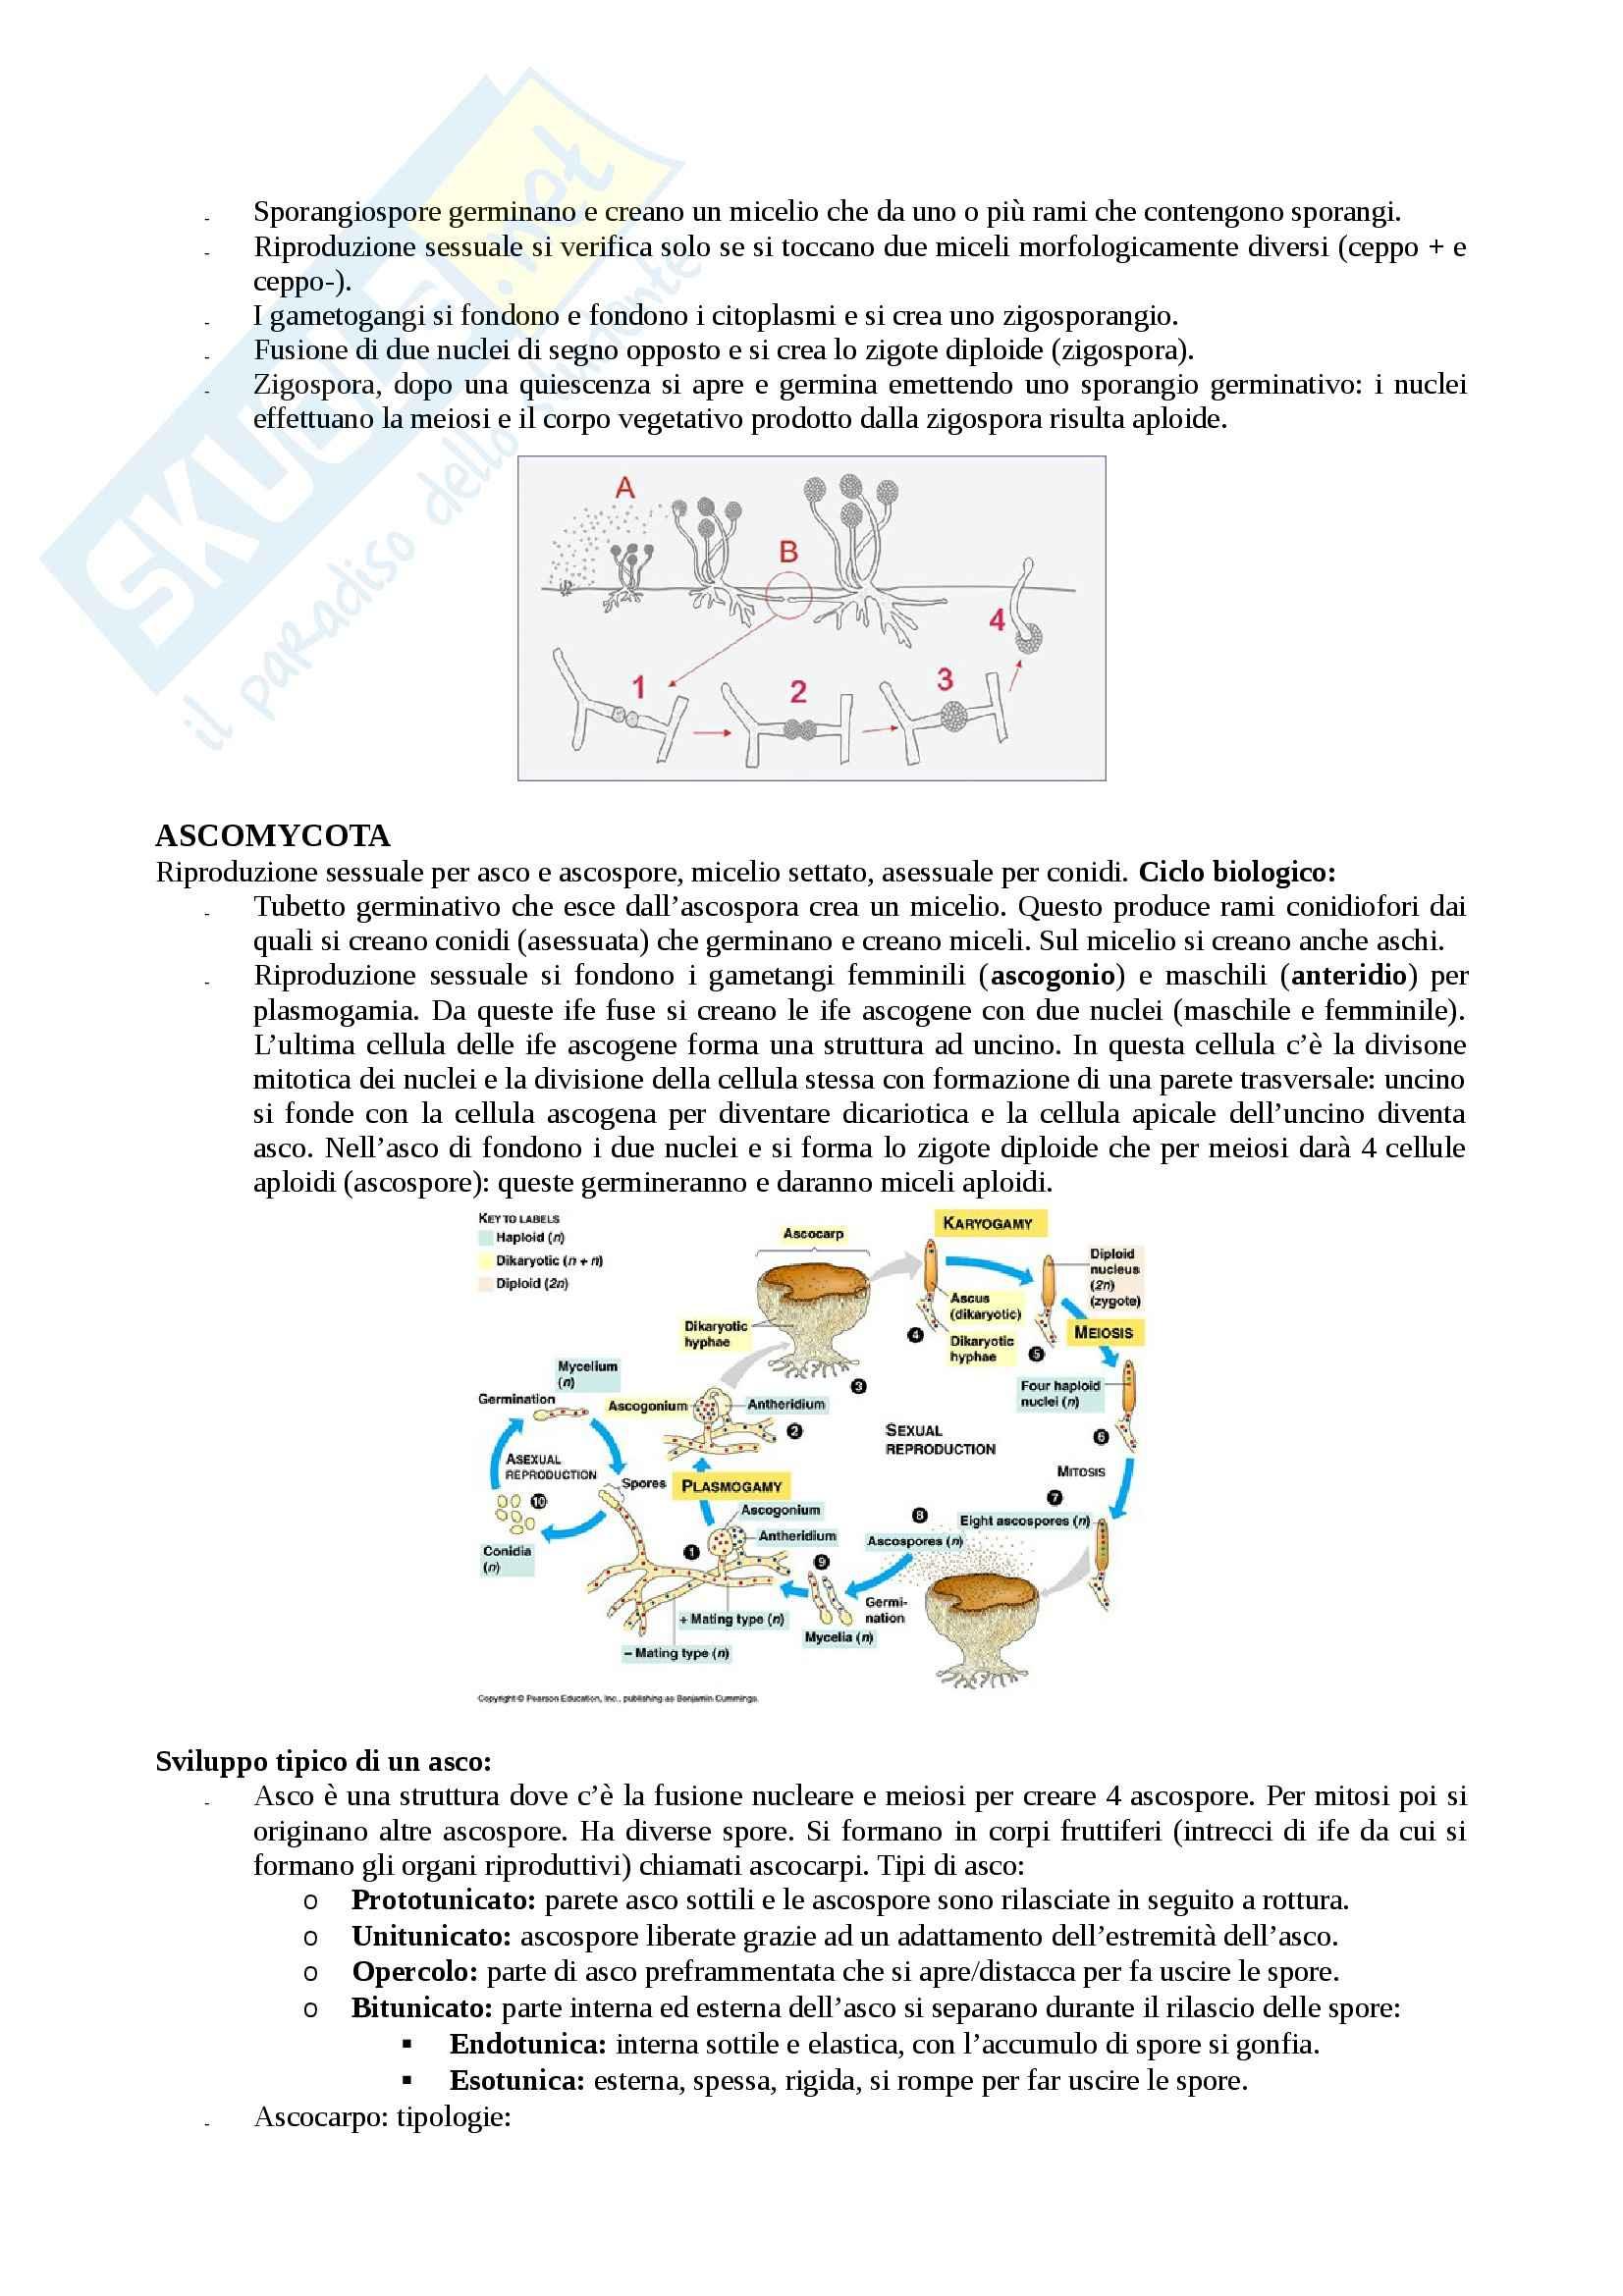 Microbiologia agraria - Appunti Pag. 96